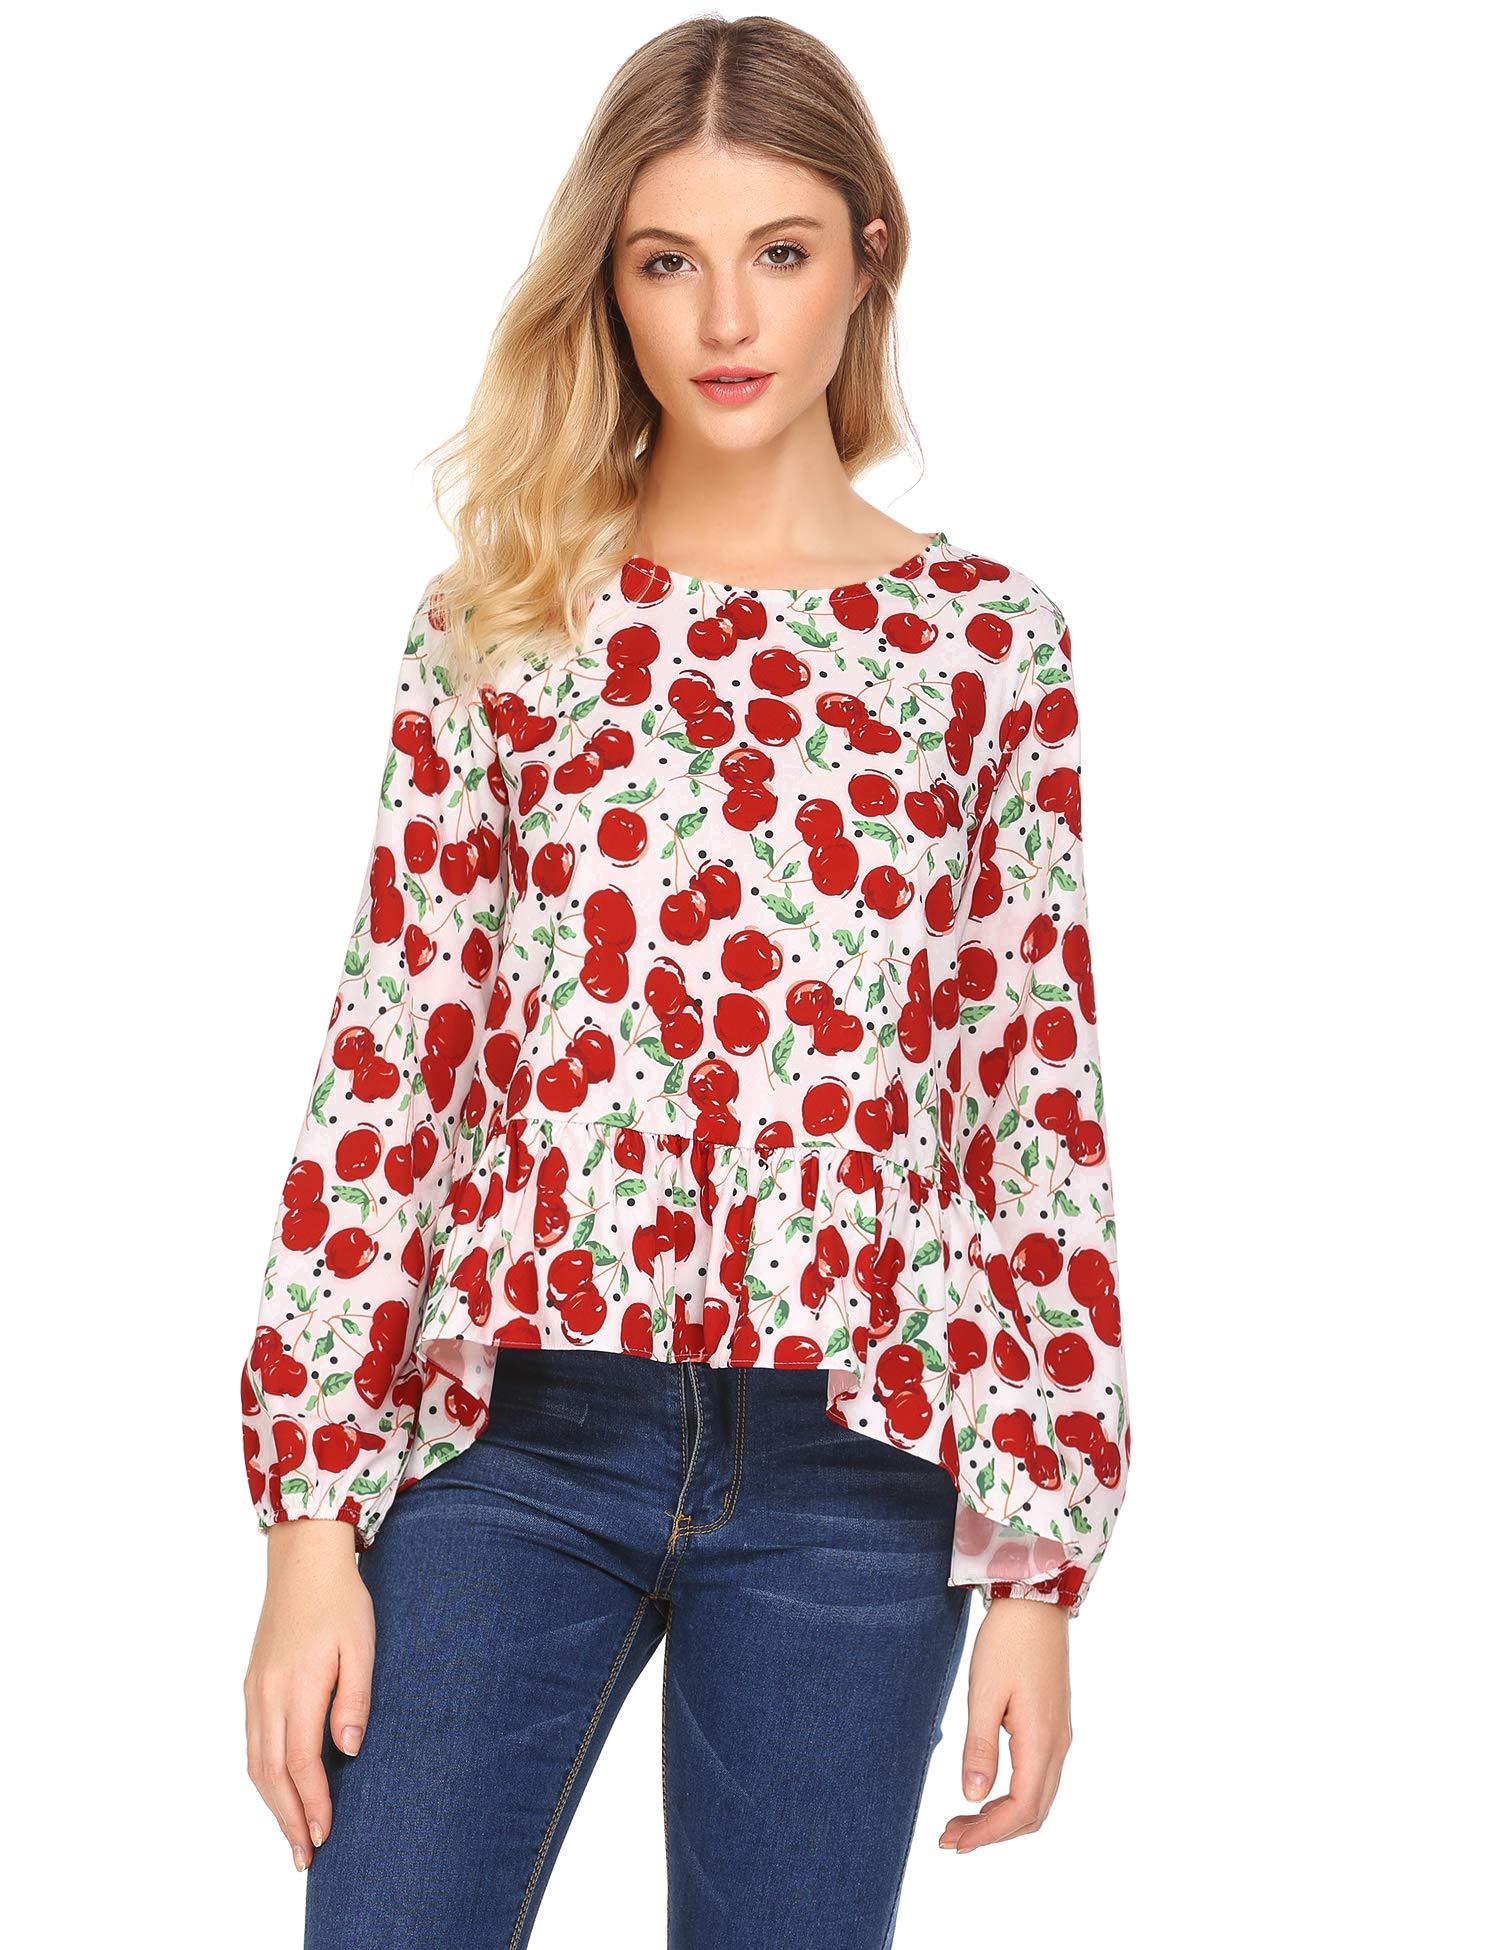 SoTeer Women Casual O-Neck Lantern Sleeve Prints A-Line Asymmetrical Hem Sexy Blouse T-Shirt Tops